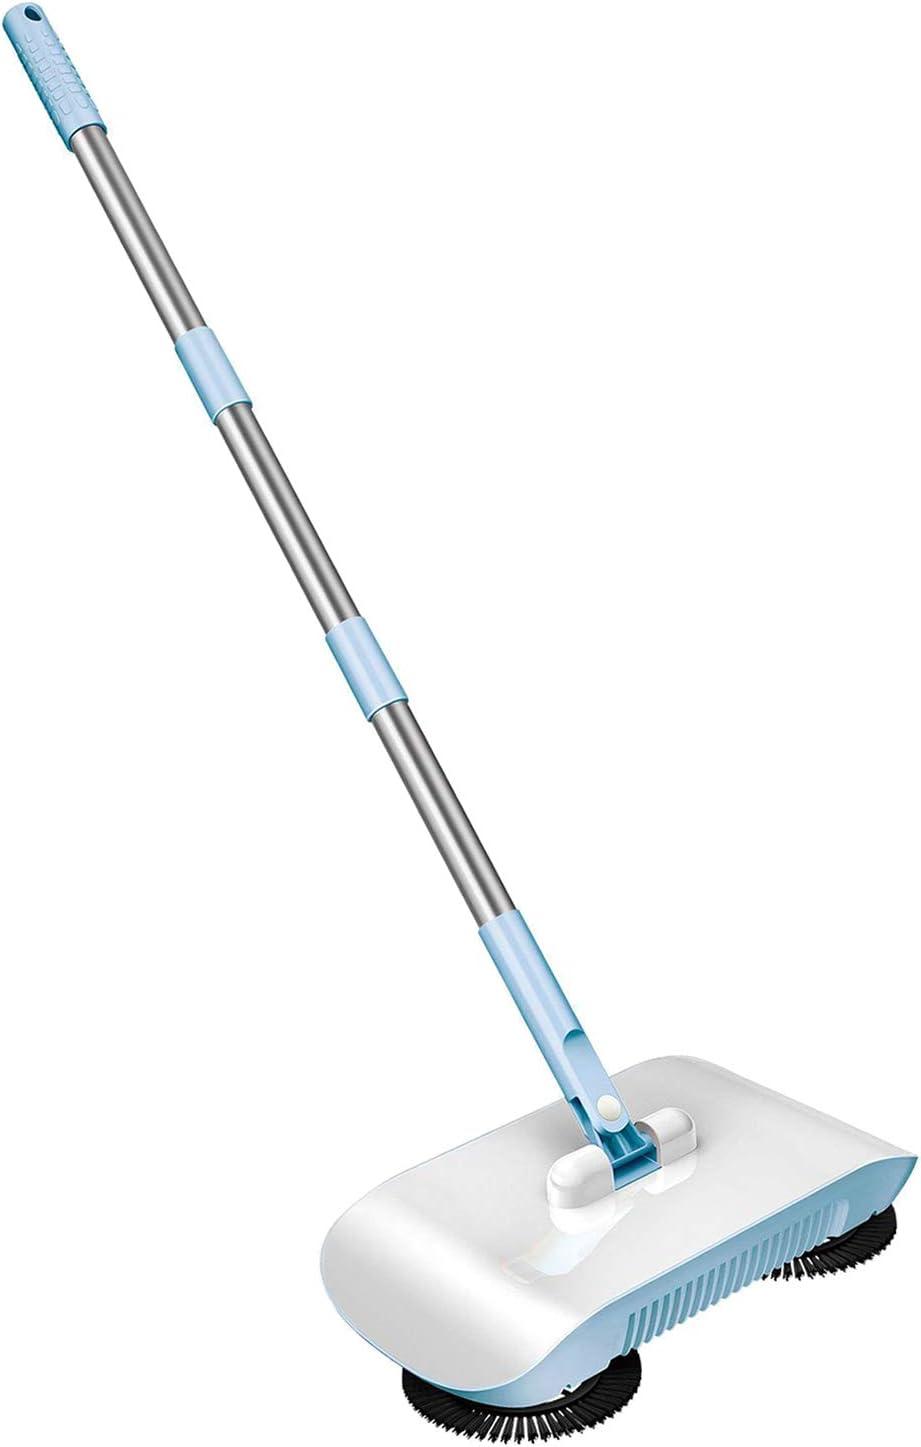 LOVIVER Push Power Spinning Broom 3 Floor Sweeper Cleaner Max 42% OFF Vacuum Regular discount